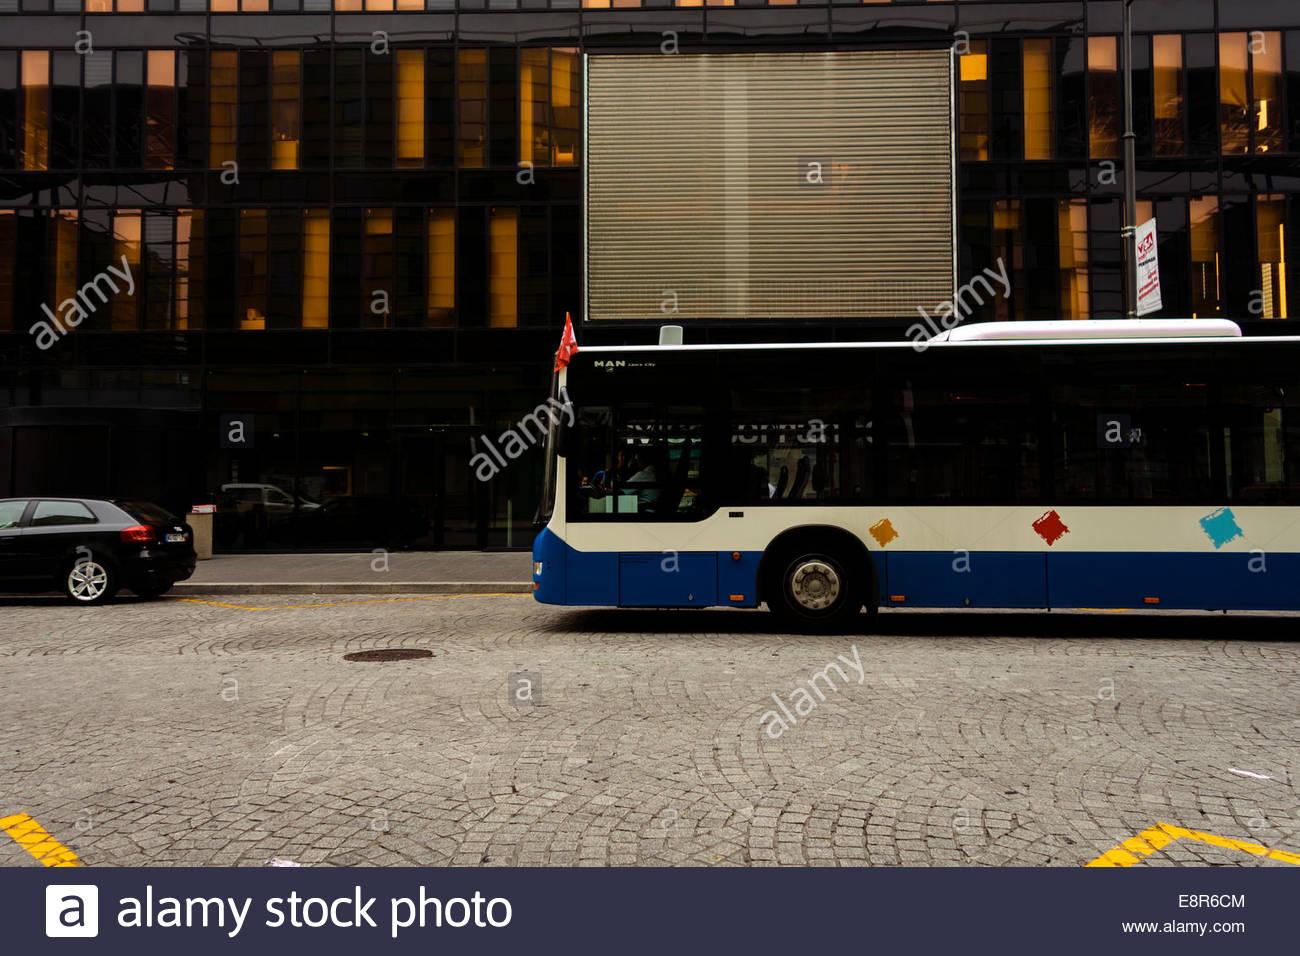 Bus dans la rue, Perpignan, France. Photo Stock